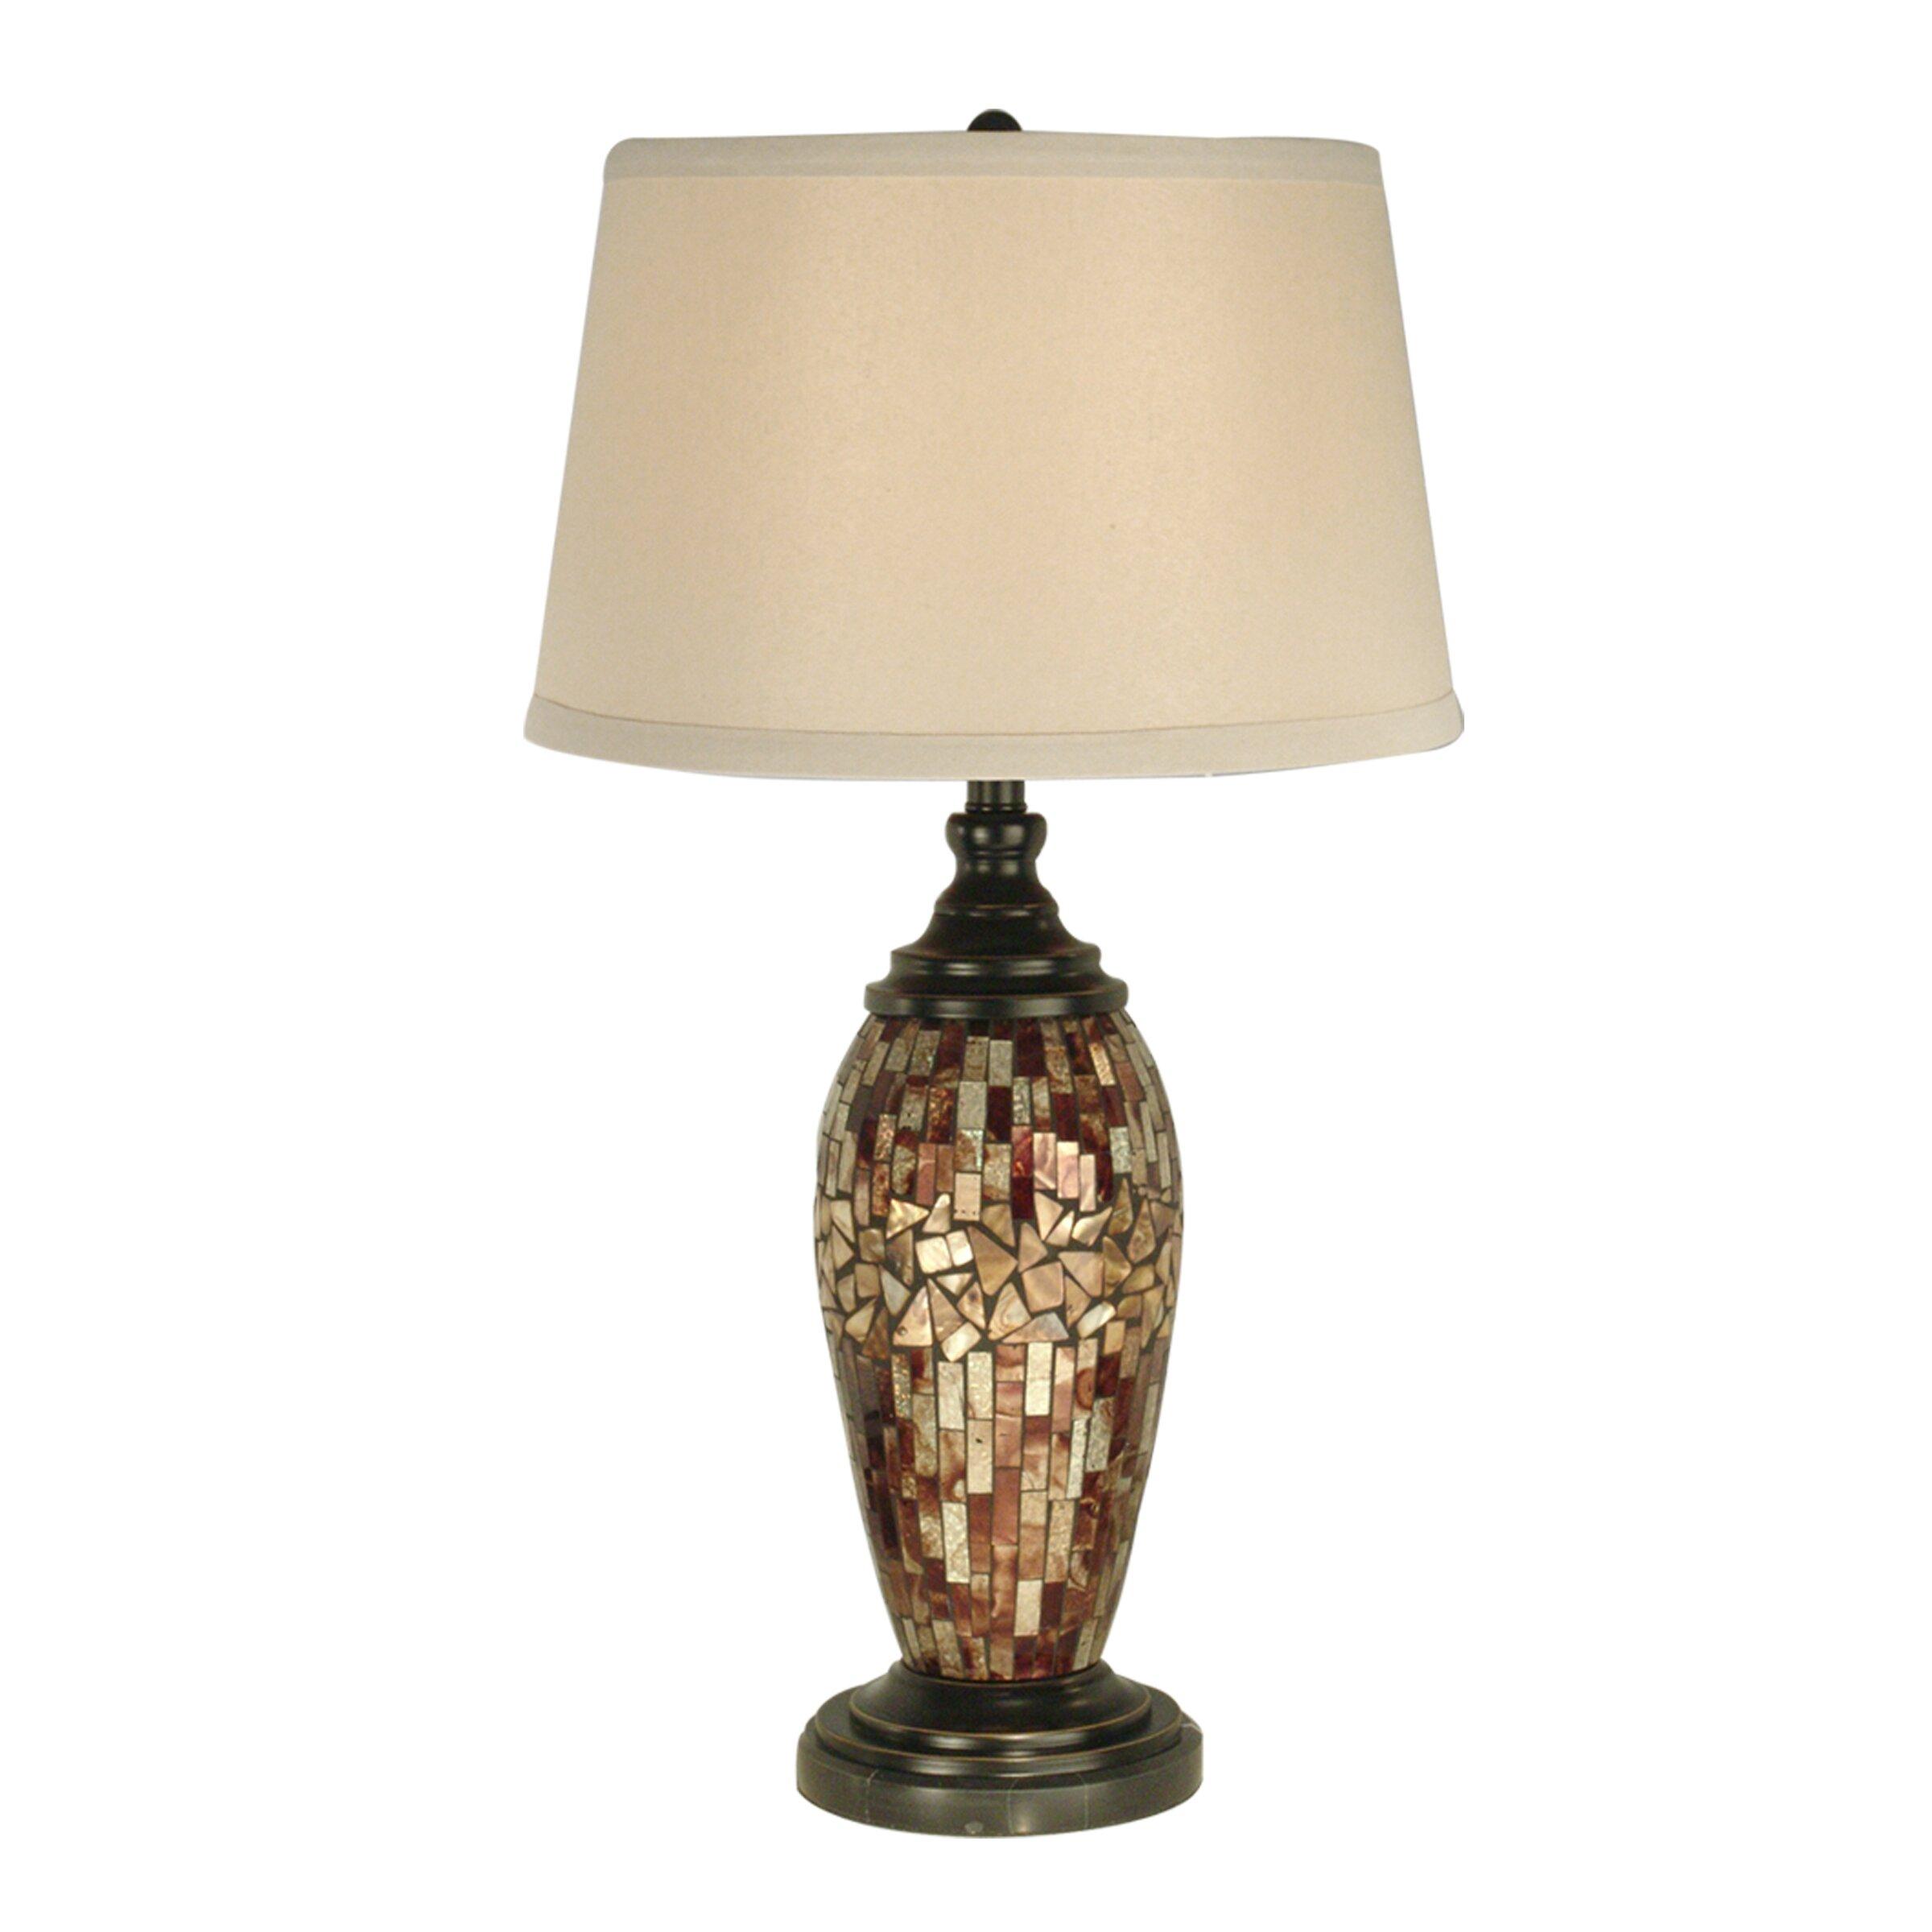 "Dale Tiffany Mosaic Oval Art Glass 30"" Table Lamp ..."